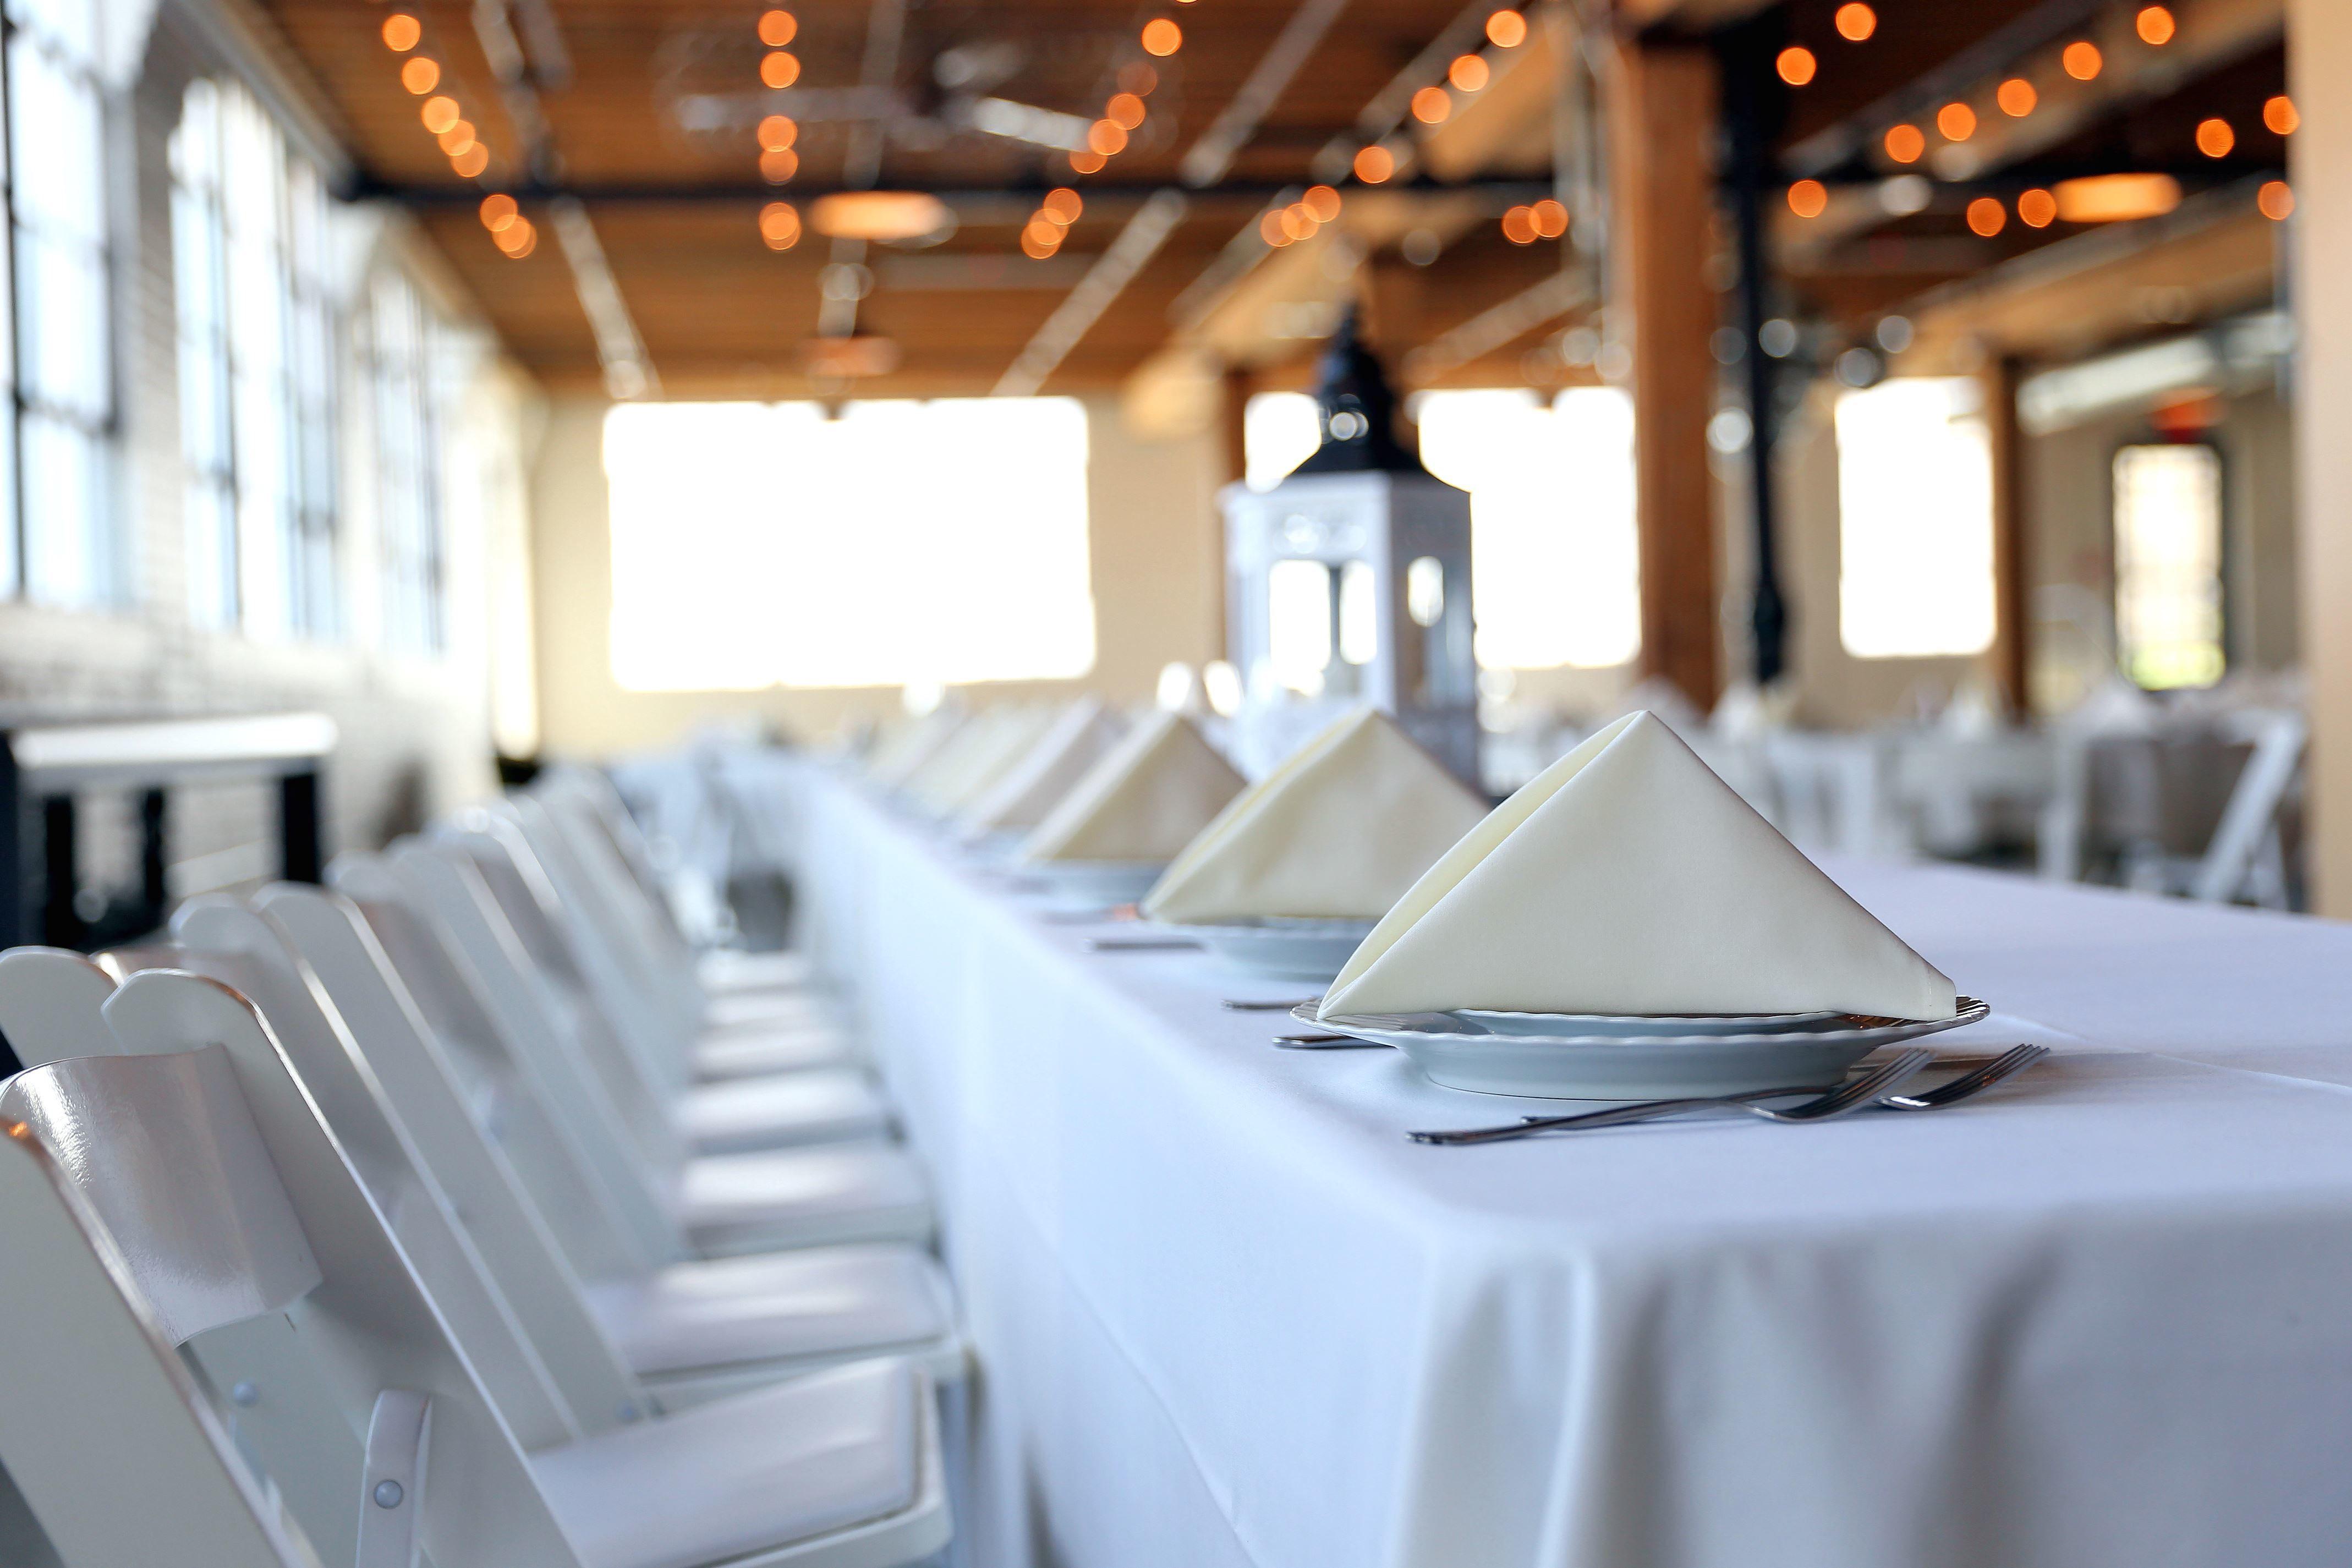 Image Libre Table Amnagement Luxe Propre Restaurant